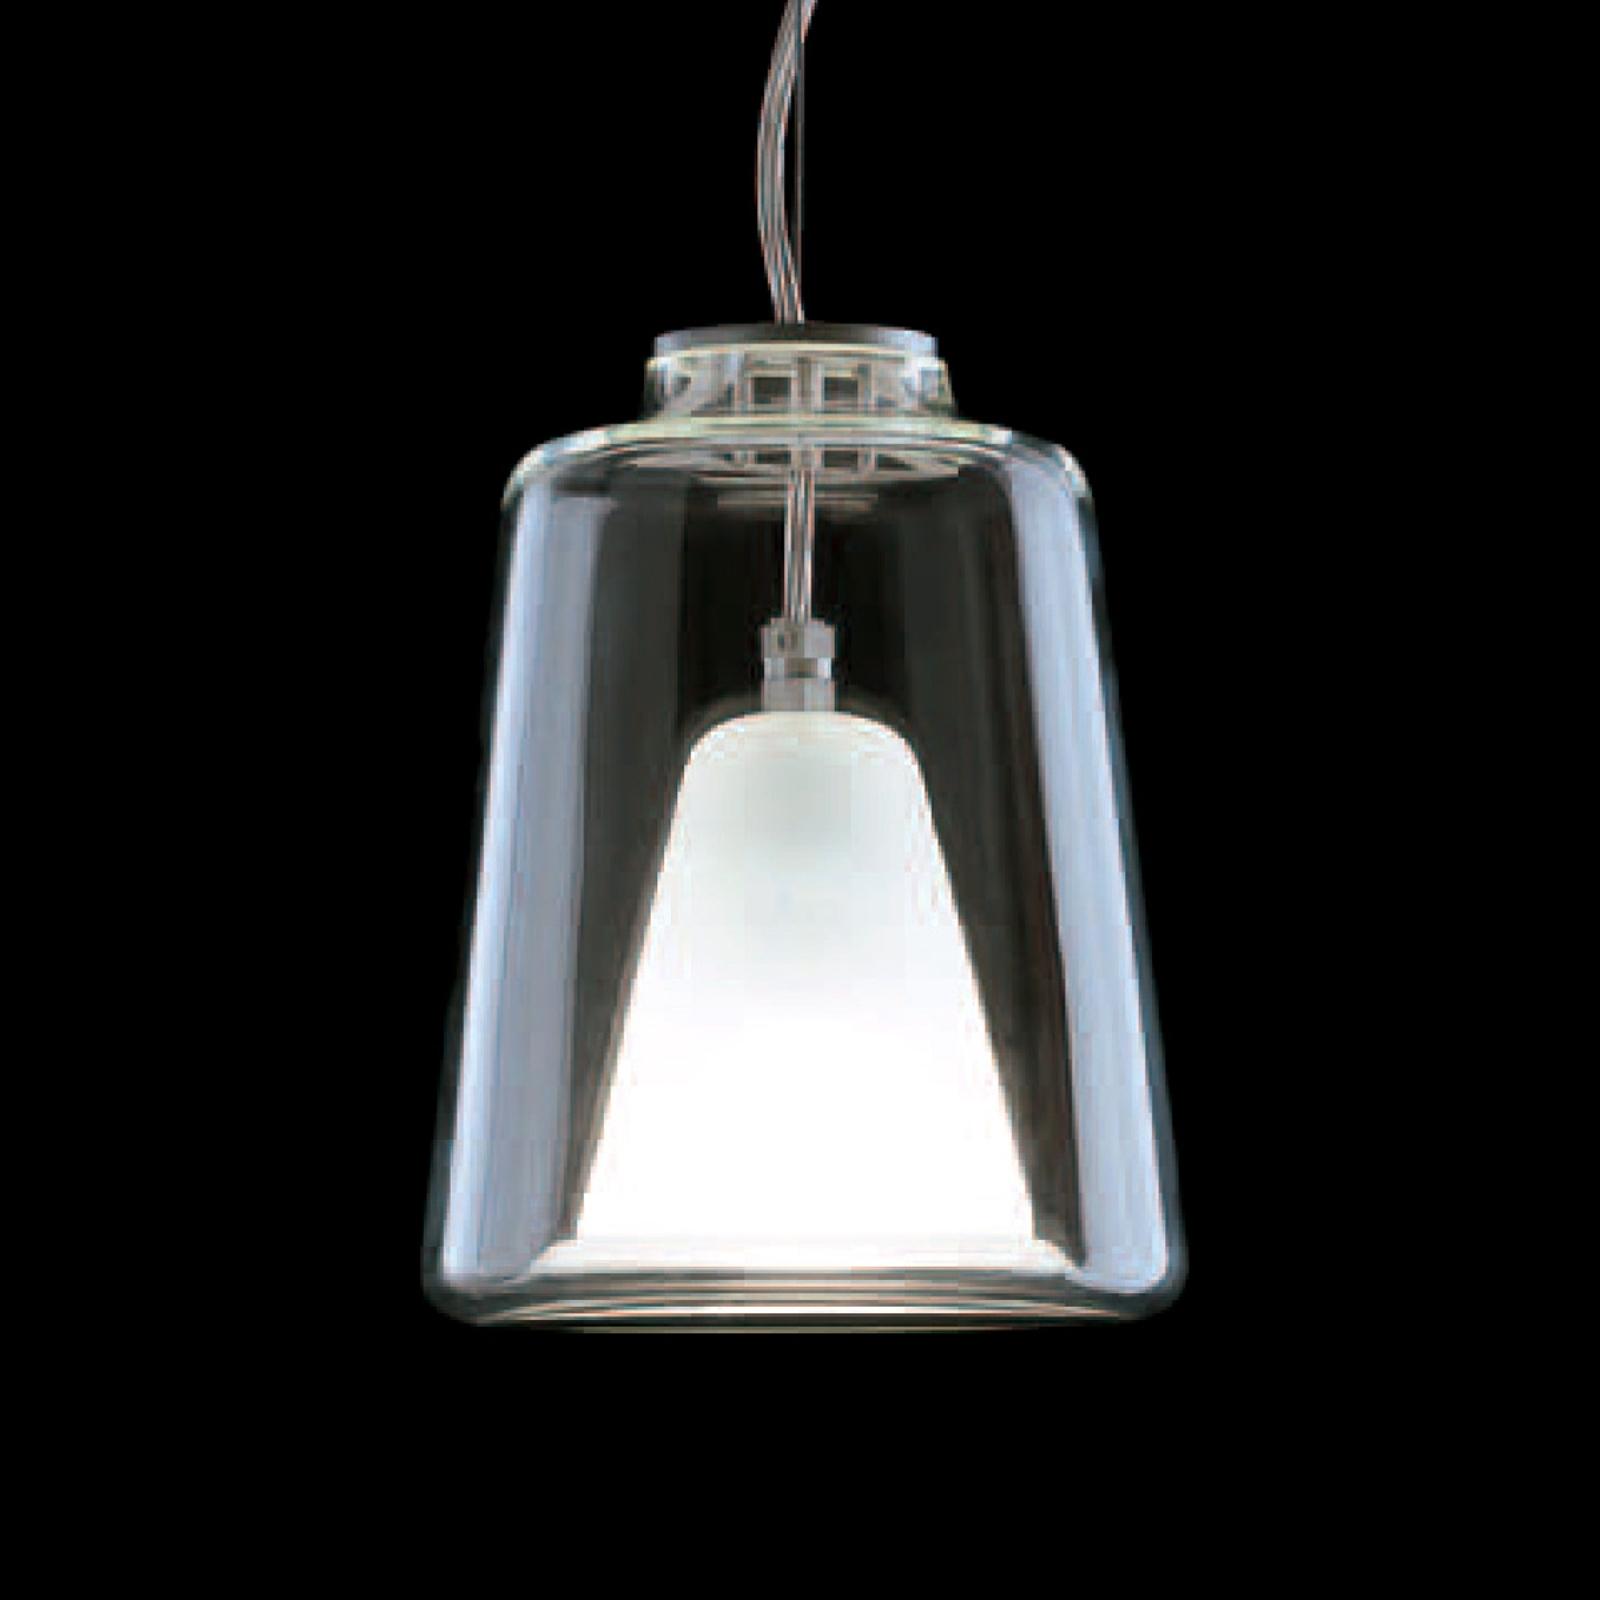 Oluce Lanterna - Murano glas hanglamp